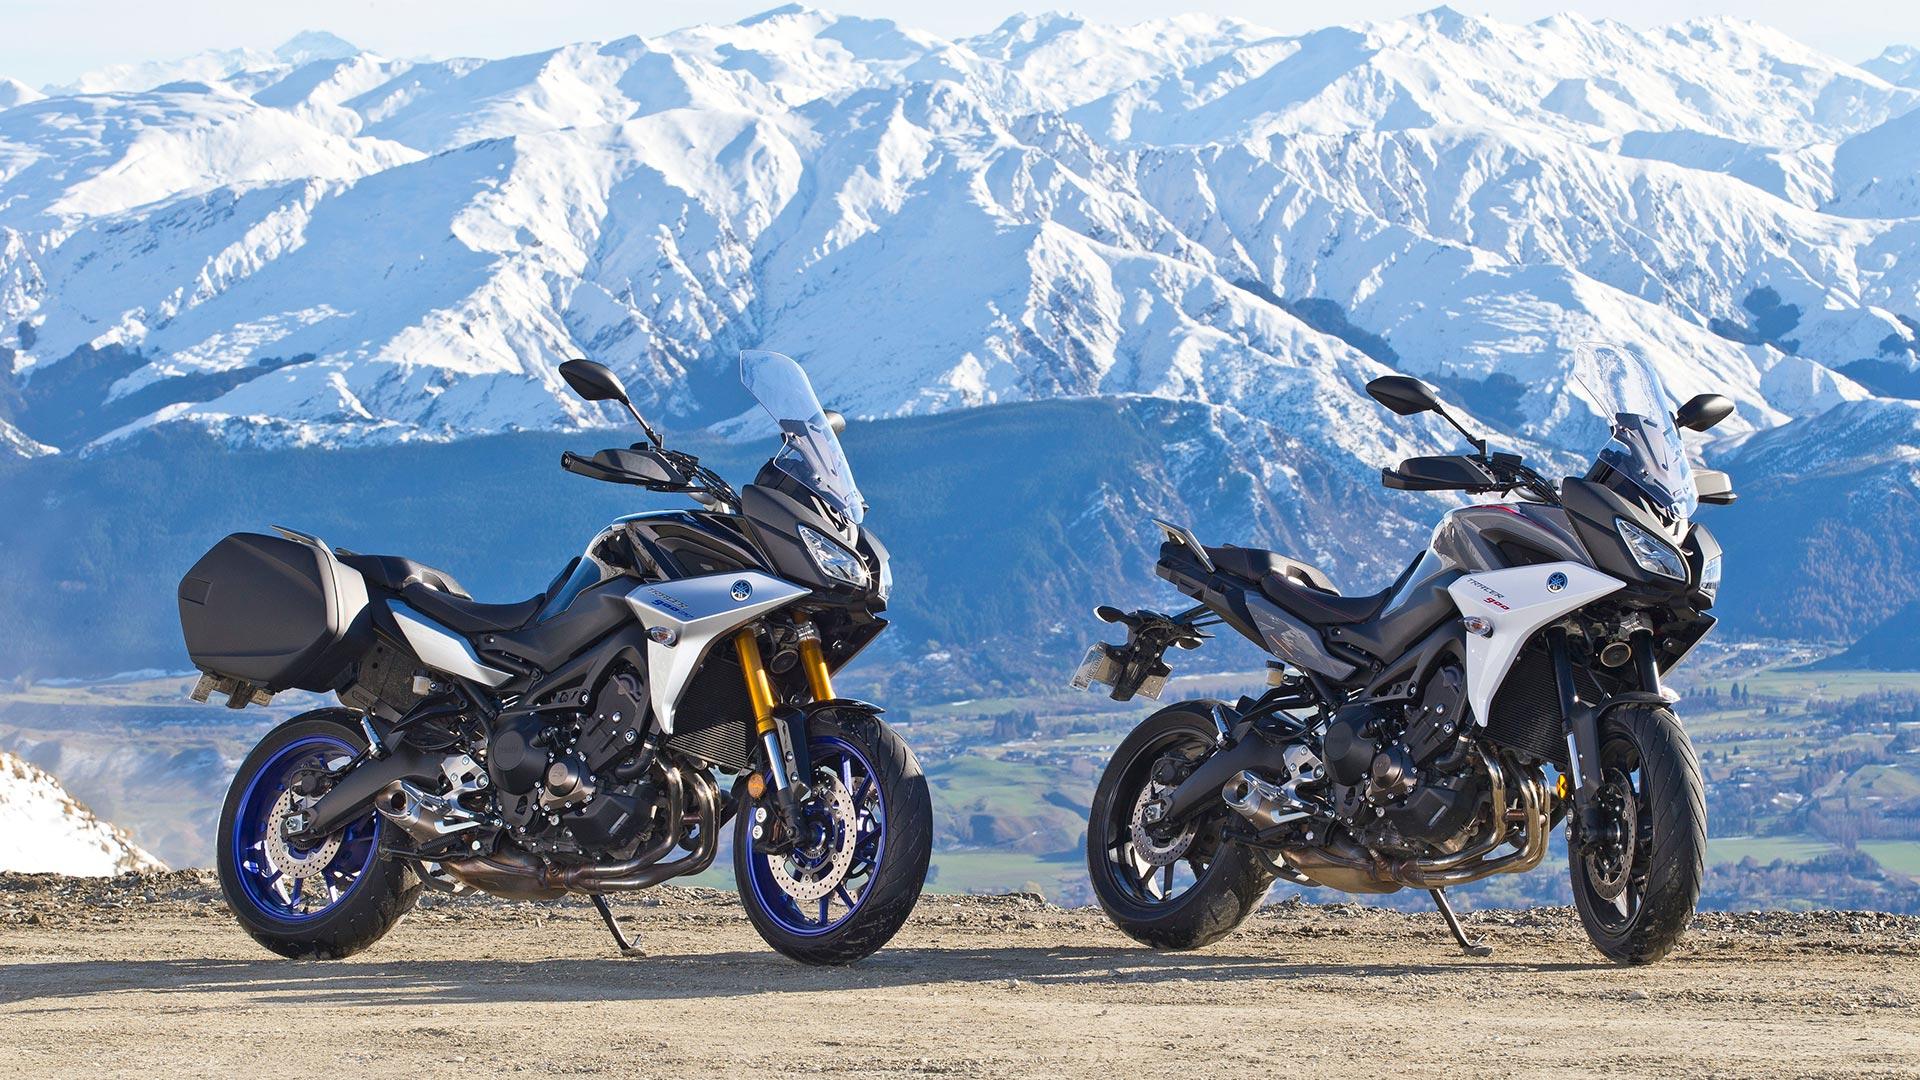 Yamaha Bikes Wallpaper 2014 Yamaha Tracer 900GT Re...